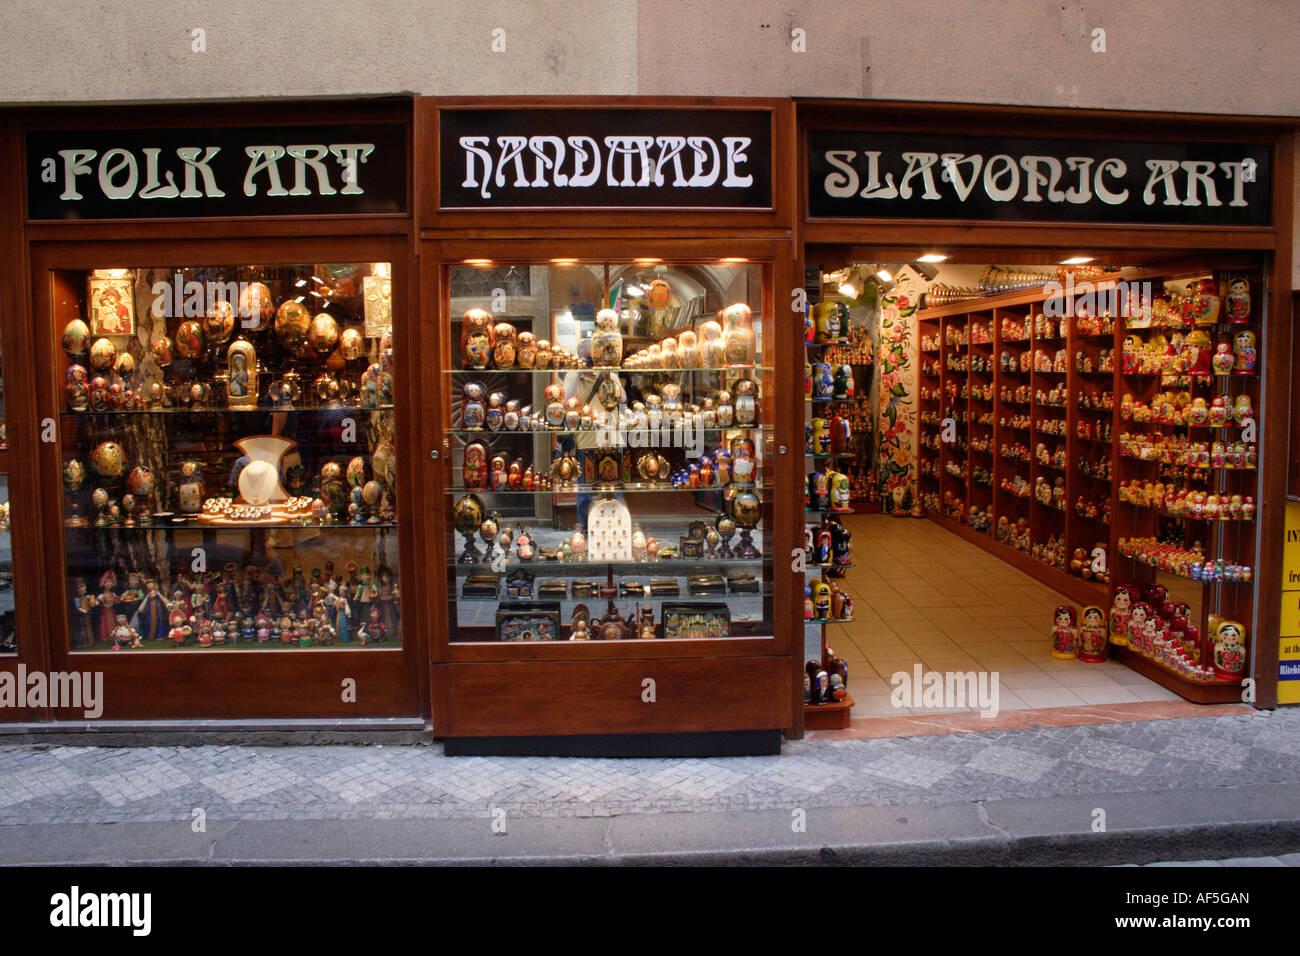 Slavonic Folk Art Shop Old Town Prague - Stock Image